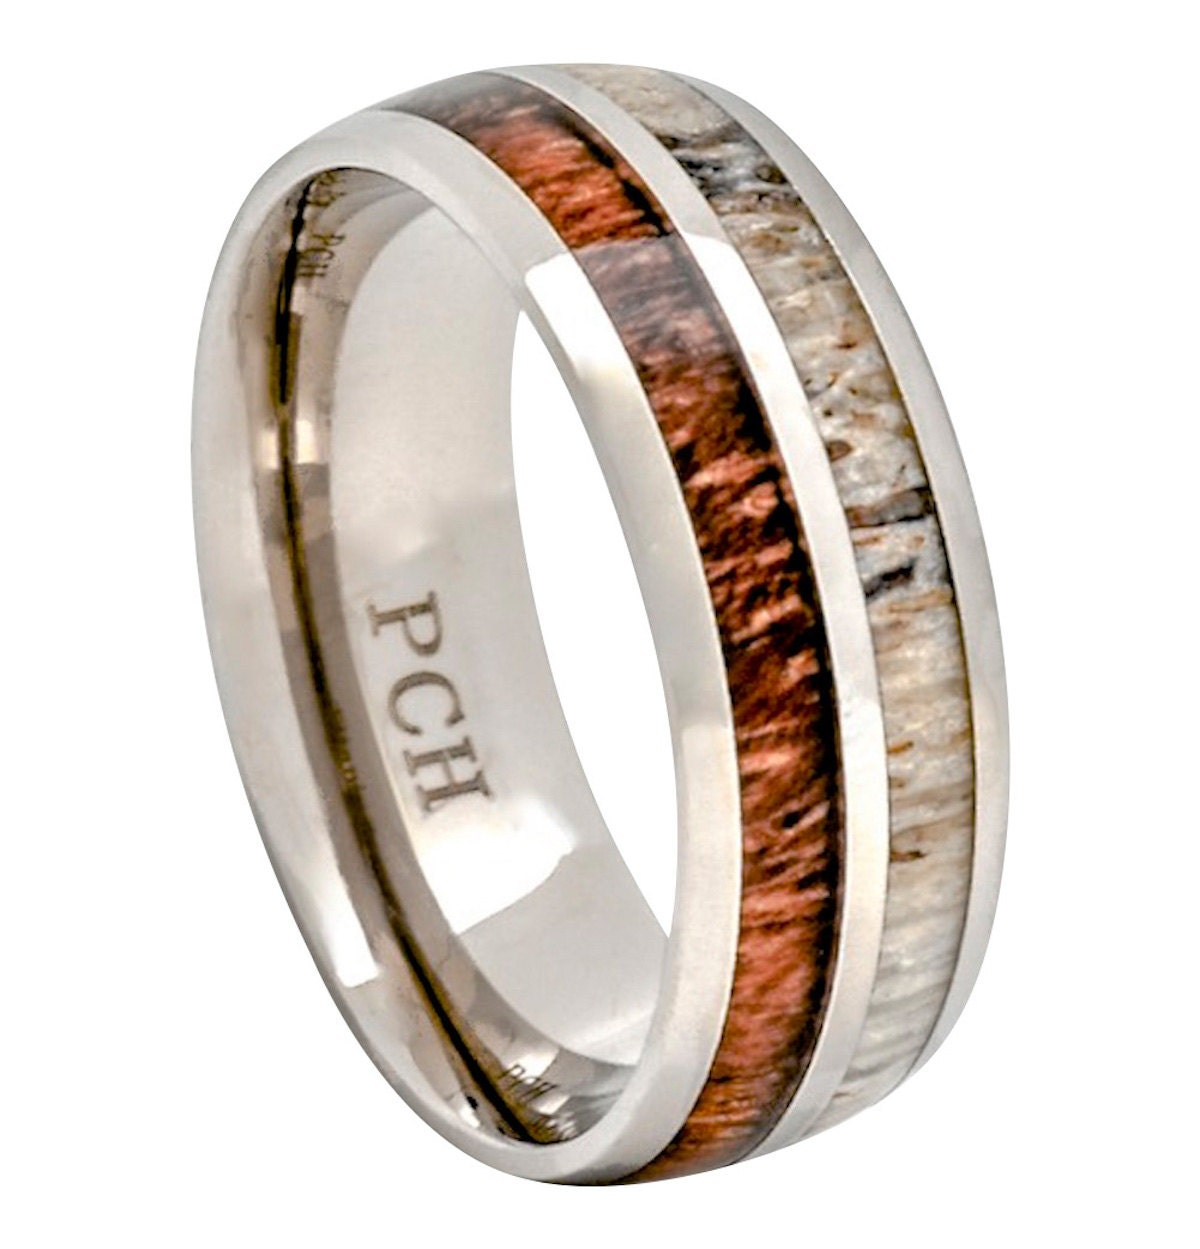 deer ring deer wedding bands Deer Antler and Koa Wood Ring Titanium Mens Wedding Band Comfort Fit